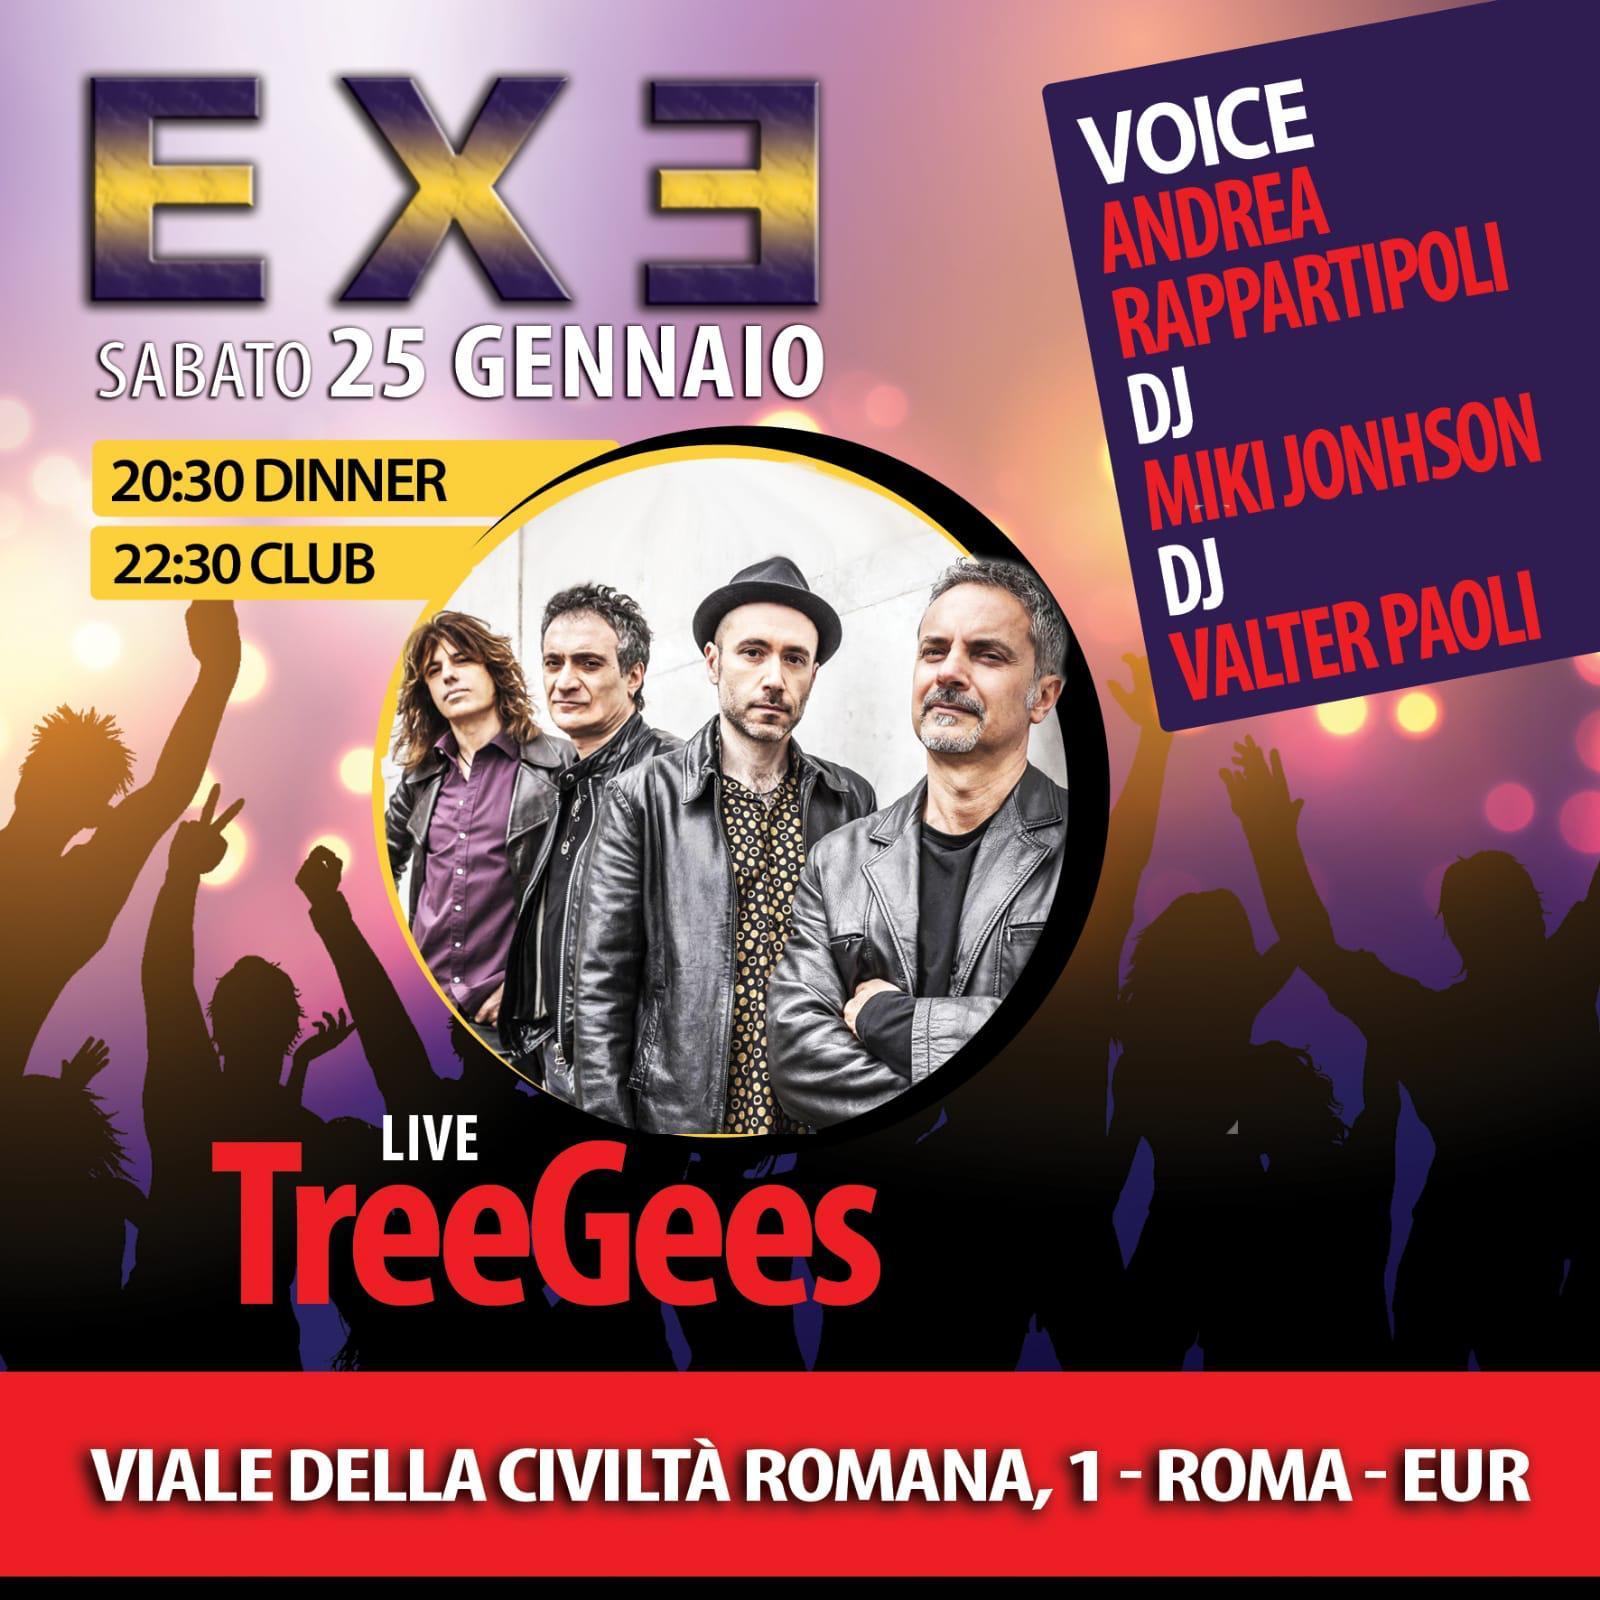 Discoteca EXE sabato 25 gennaio 2020 Aperitivo Cena Club